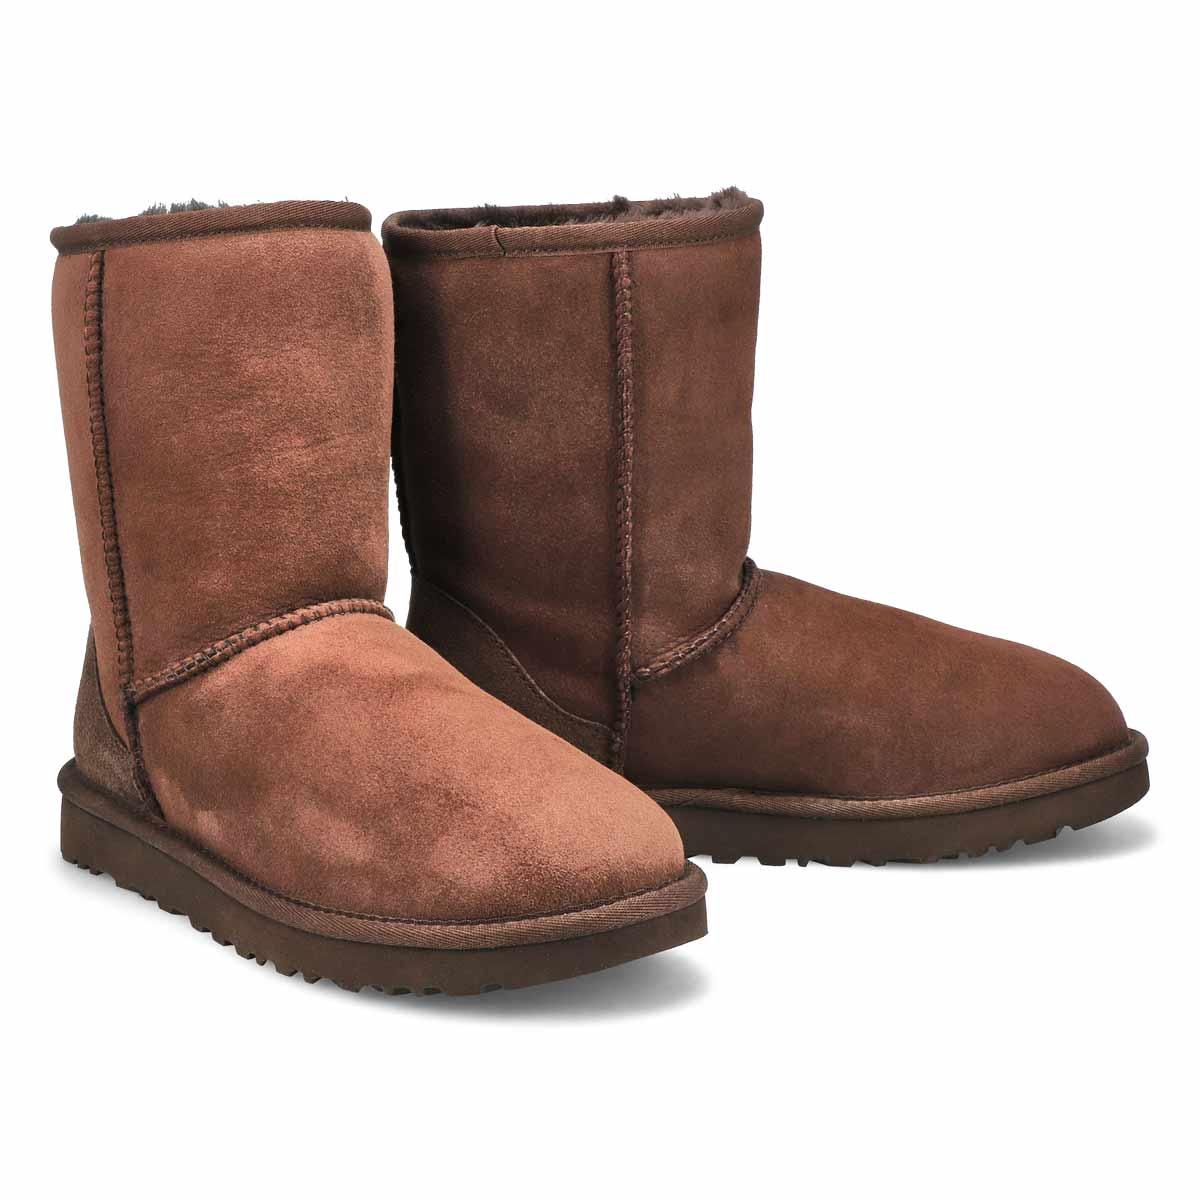 Lds Classic Short II choc sheepskin boot